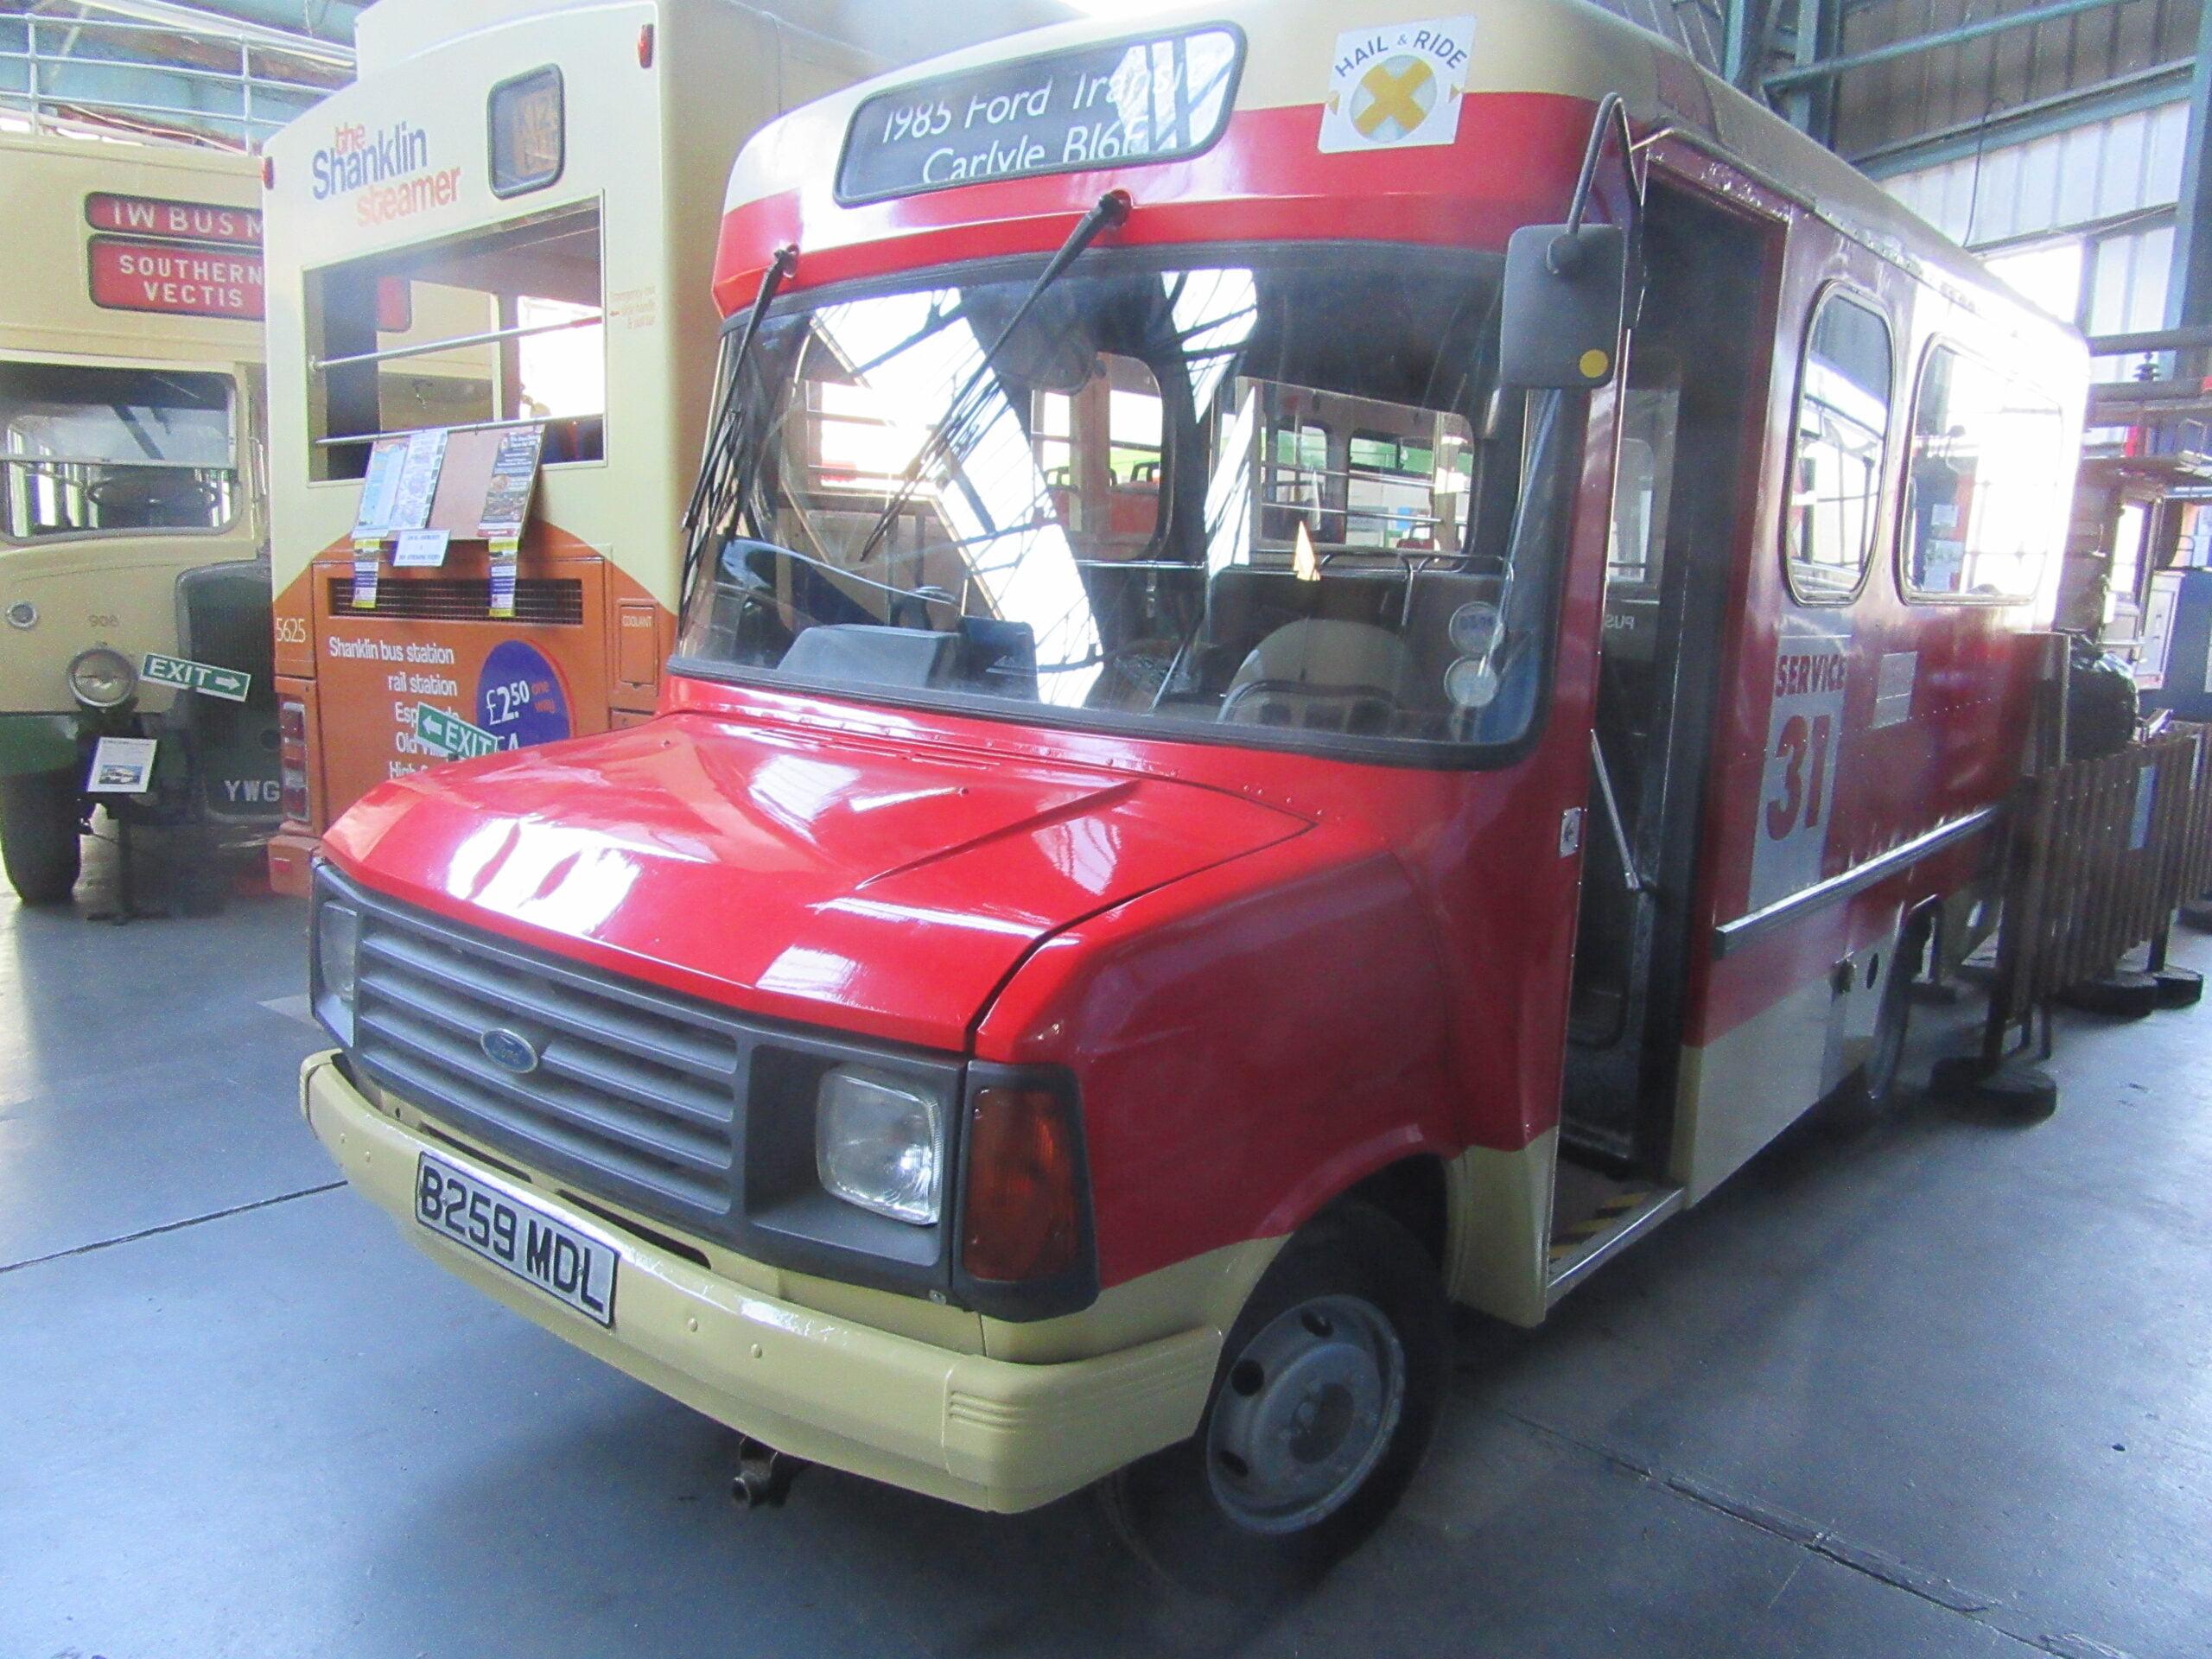 1984 Ford Transit – 259 – B259 MDL